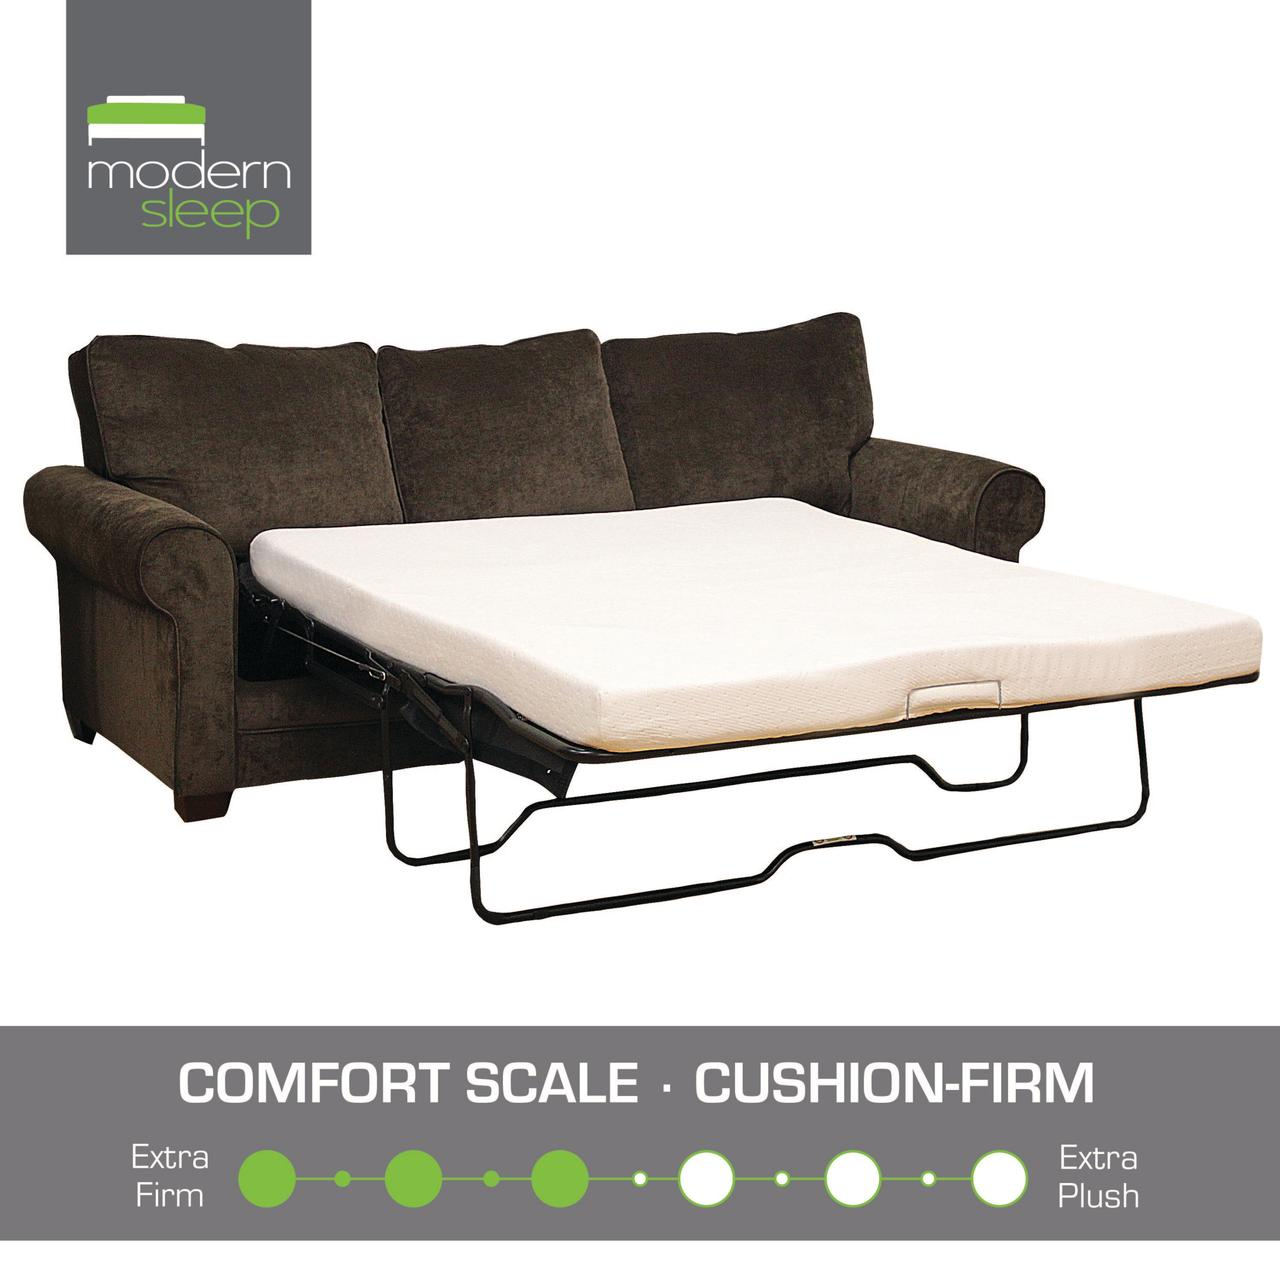 Modern Sleep Memory Foam Replacement Sofa Bed 4.5 Inch Mattress, Multiple  Sizes   Walmart.com